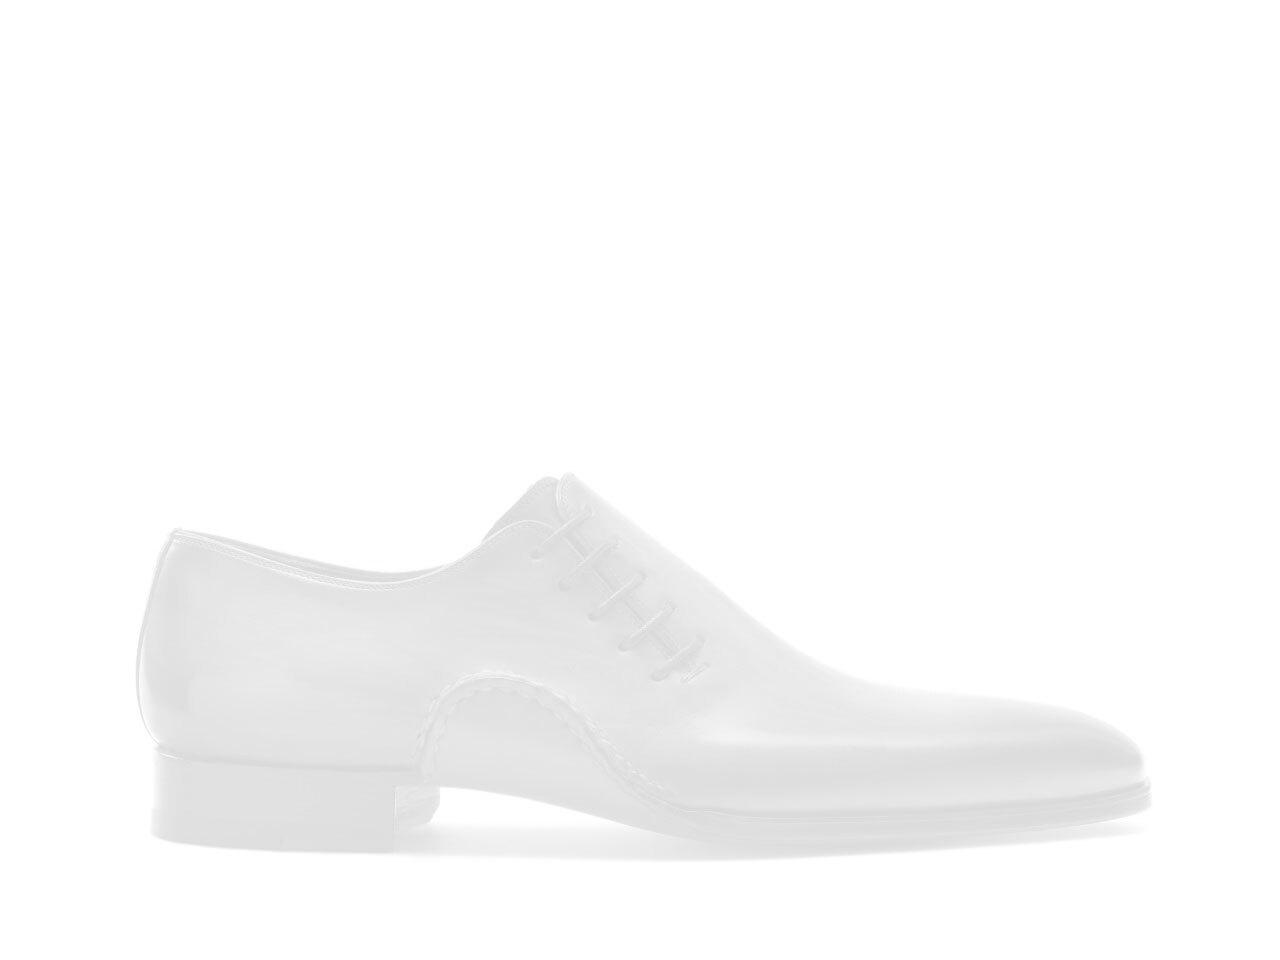 Sole of the Magnanni Ondara II Grafito Men's Double Monk Strap Shoes